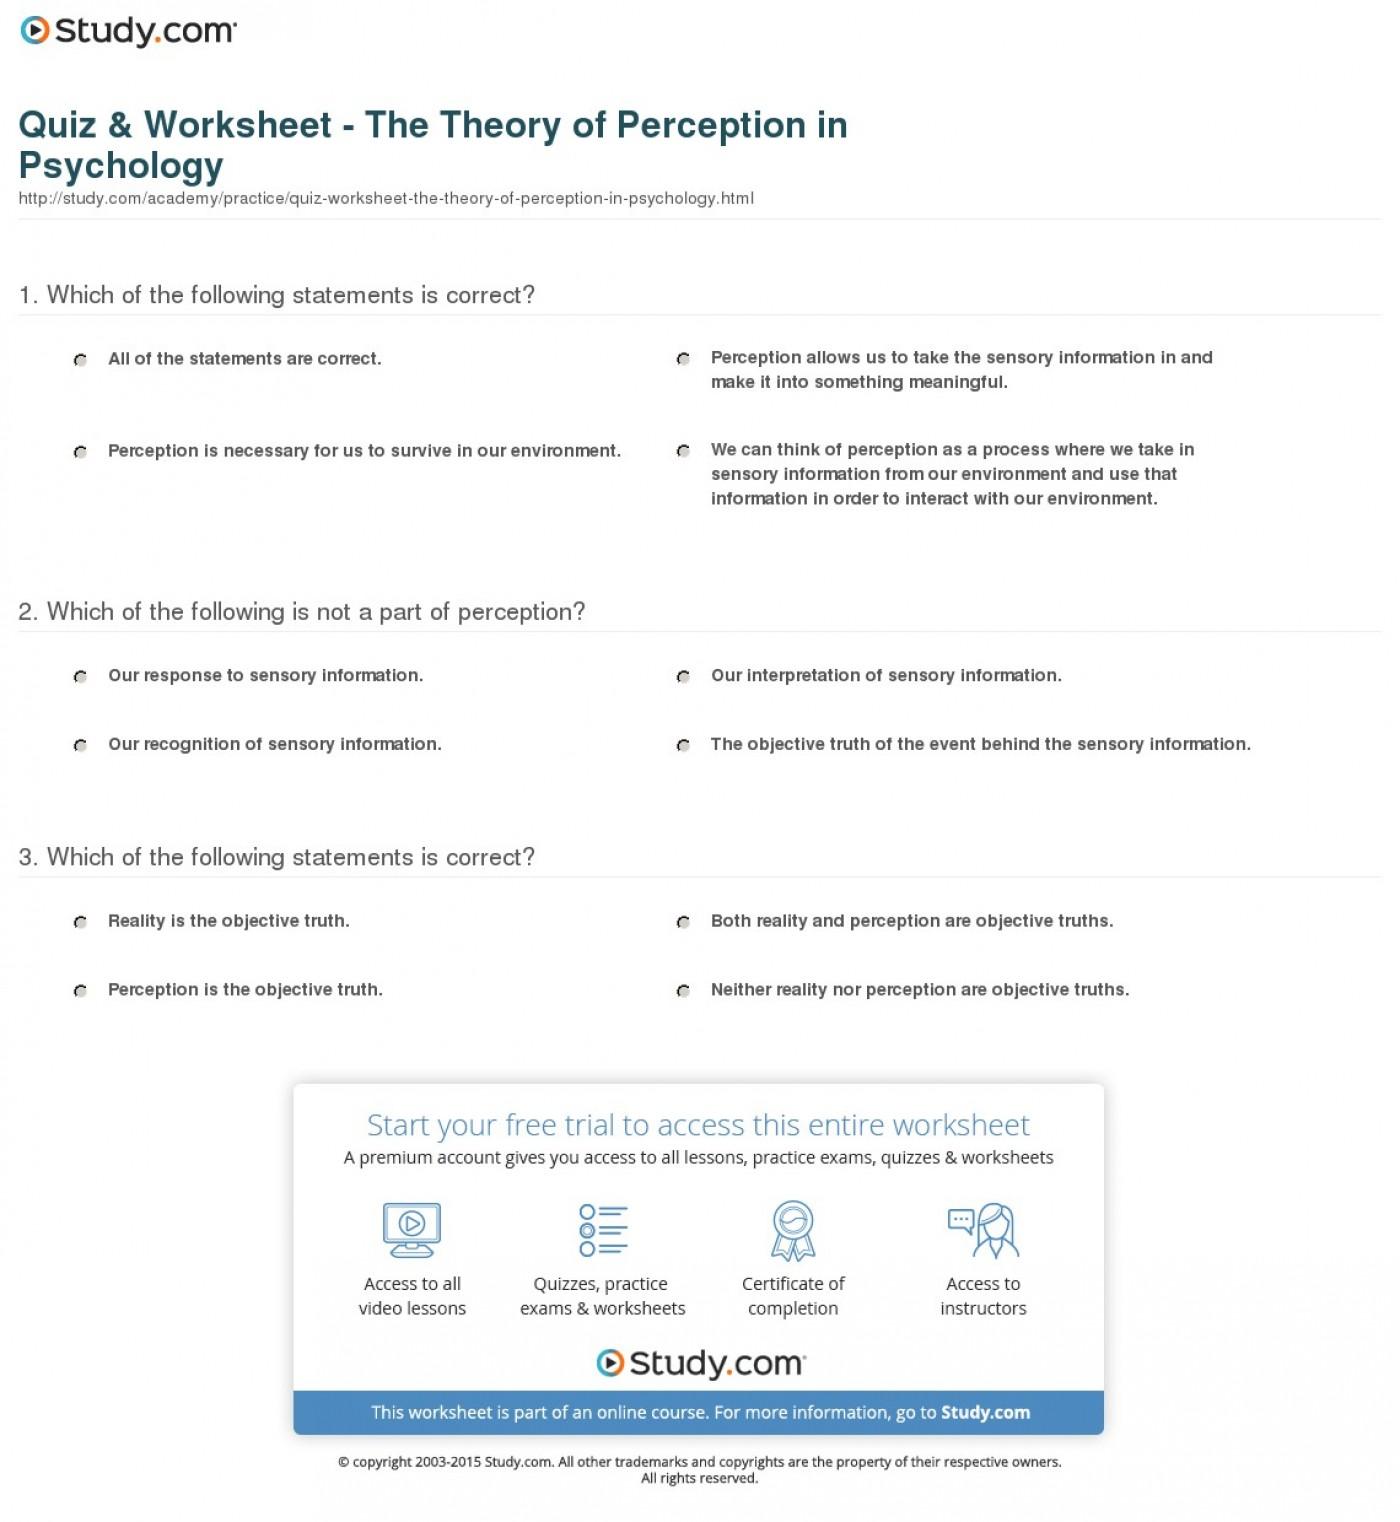 002 Critical Thinking Essay Essays Argument Examples L